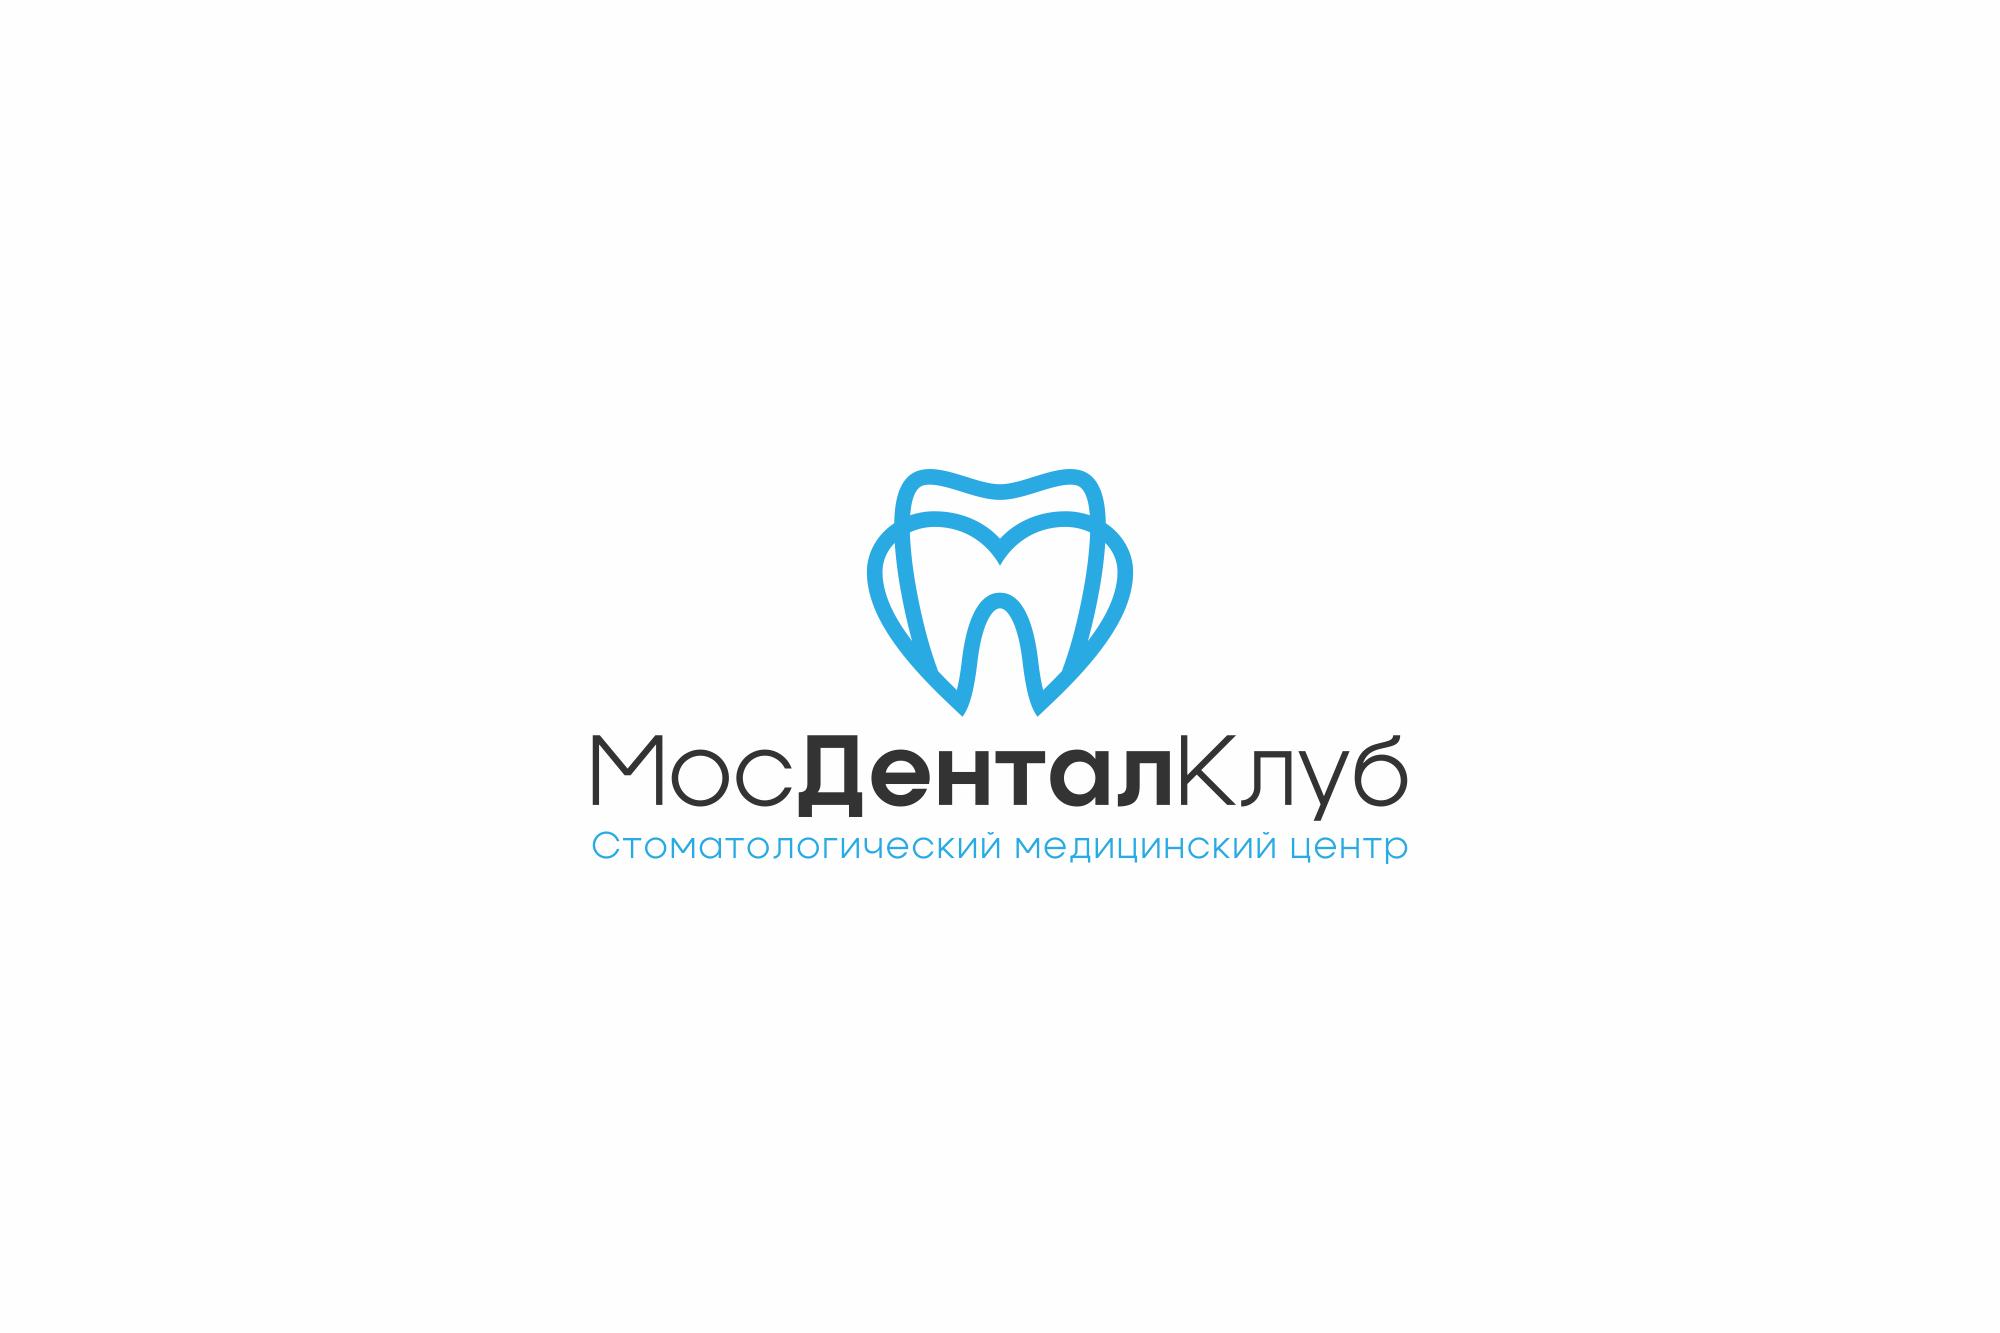 Разработка логотипа стоматологического медицинского центра фото f_4145e4eb002b08e2.jpg